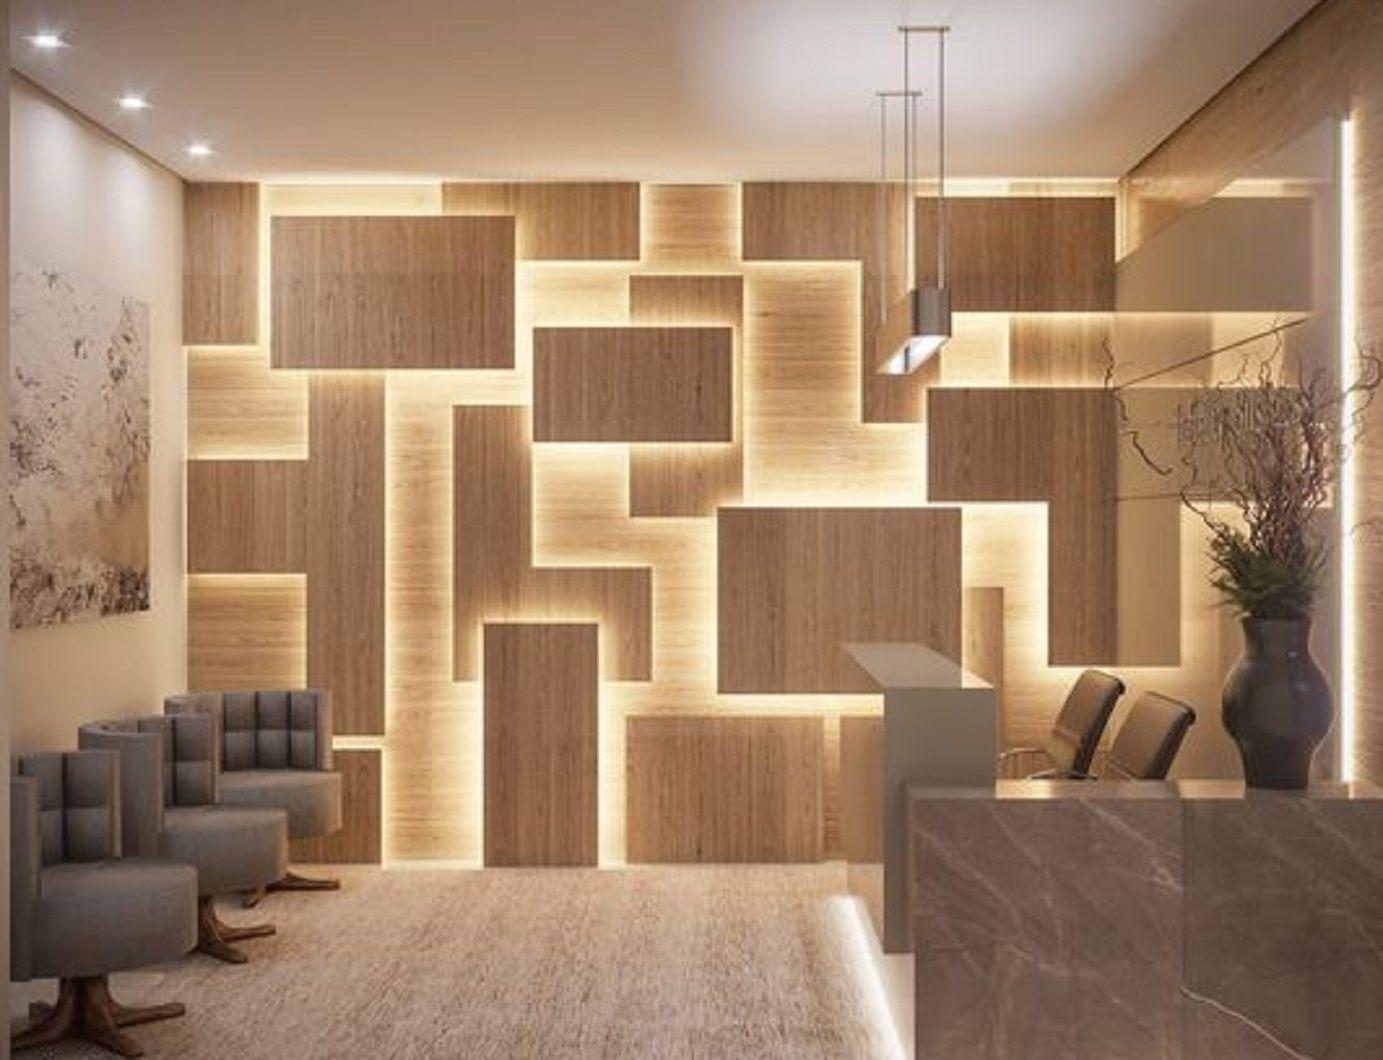 Inspiration Inspiracion Inspiration Tecnoyciencia Habitacion Wall Decor Design Interior Wall Design Wall Lighting Design